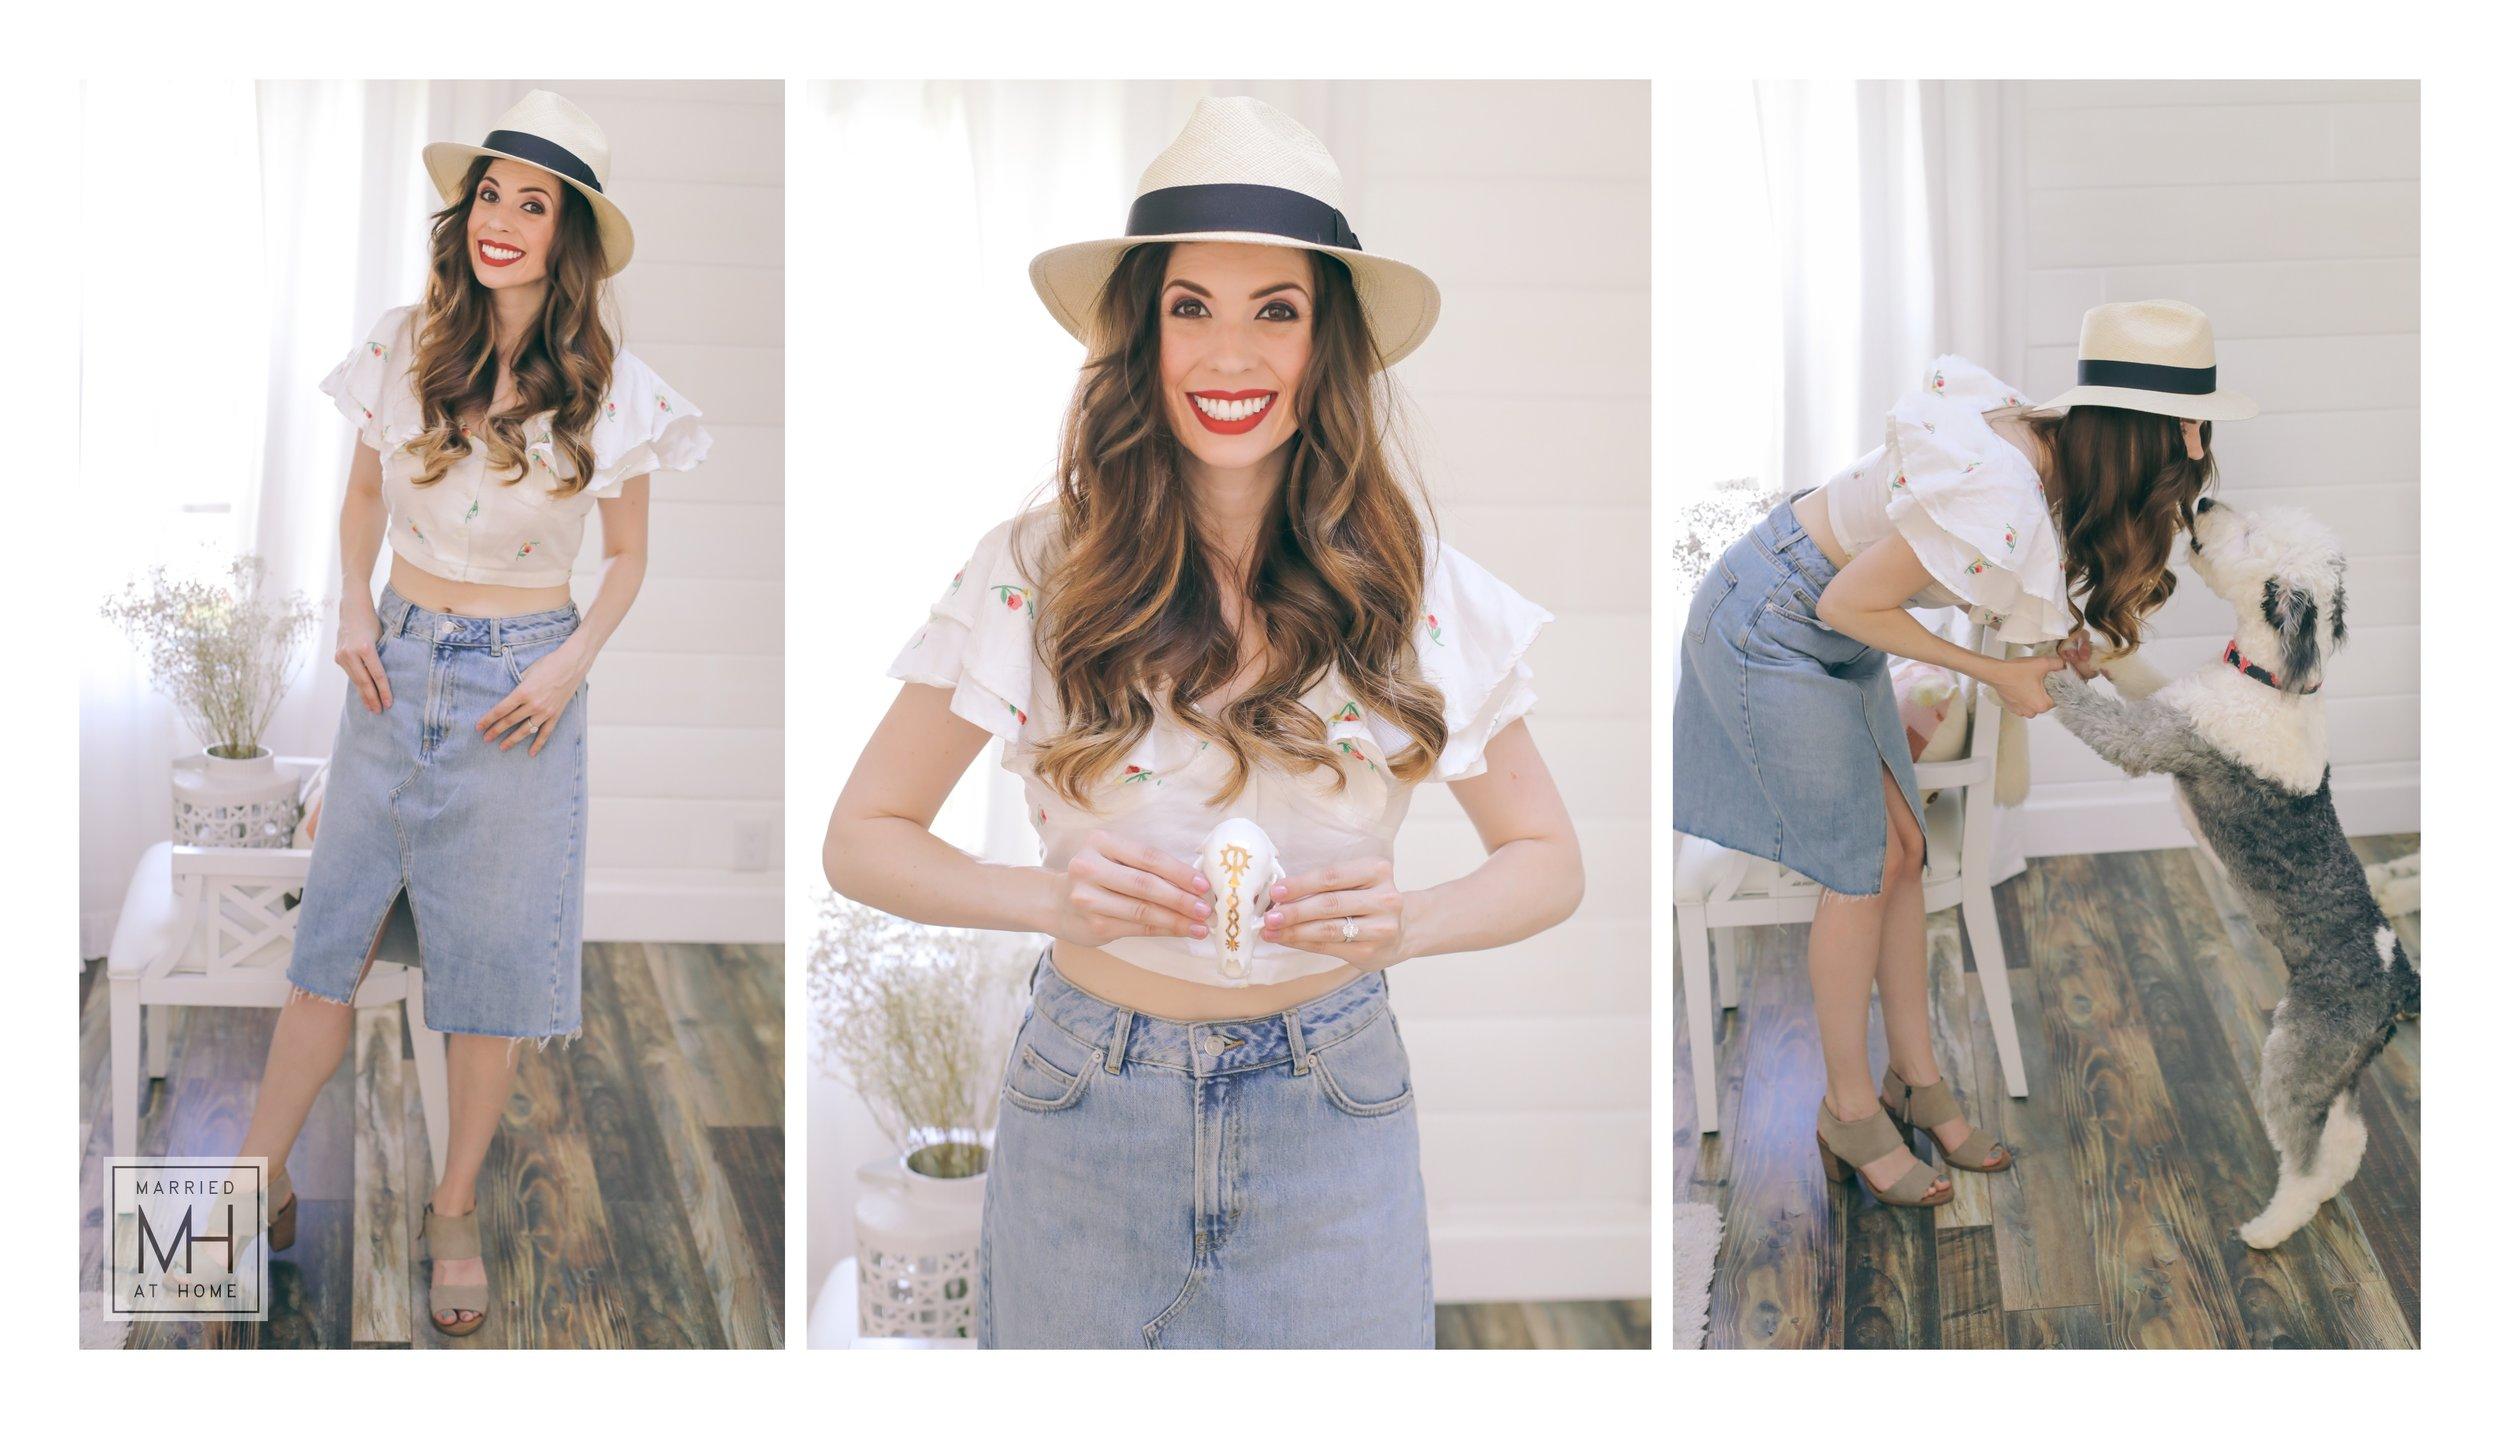 Hat:   Scala Panama Safari Hat, Natural  |  Top:   Topshop   Embroidered Frill Floral Croptop  |  Skirt:   Topshop Denim Midi Skirt  |  Shoes:   TOMS Majorca Cutout Sandals in Desert Suede